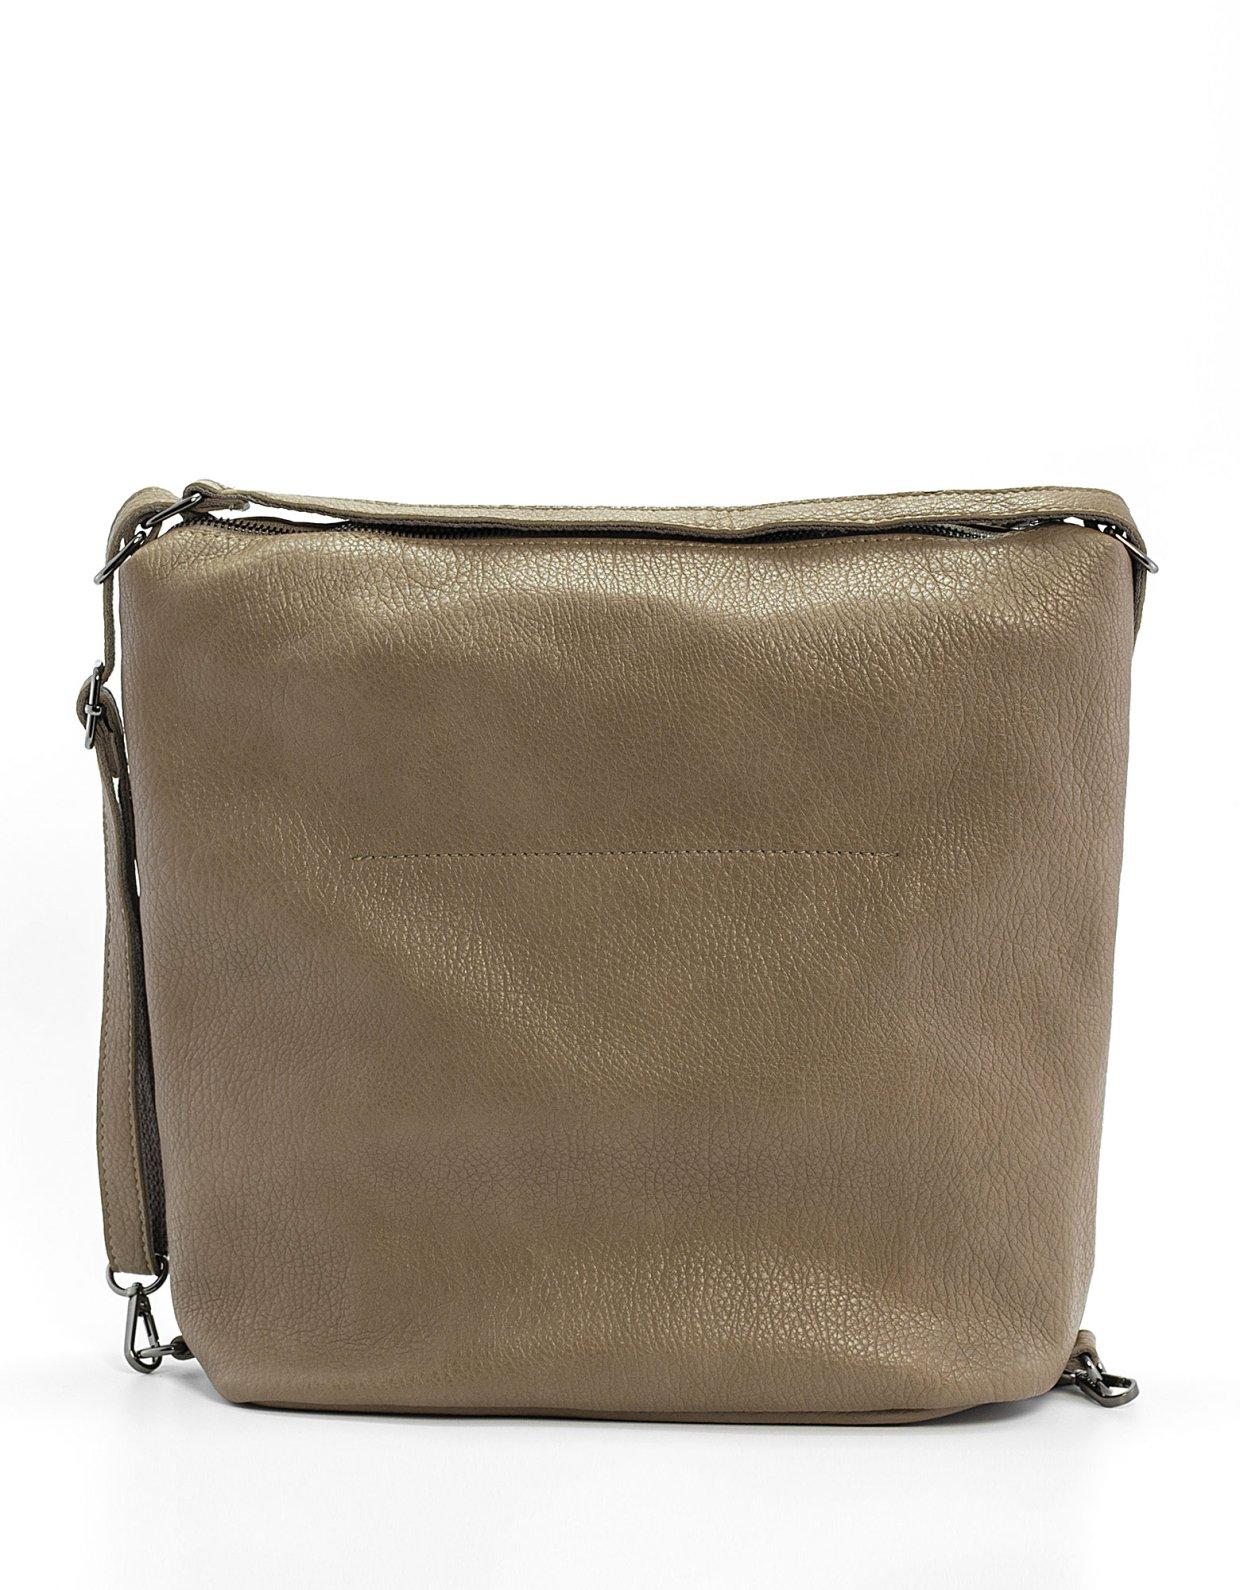 Beverly Hills Polo Club Katherine shoulder bag tortora